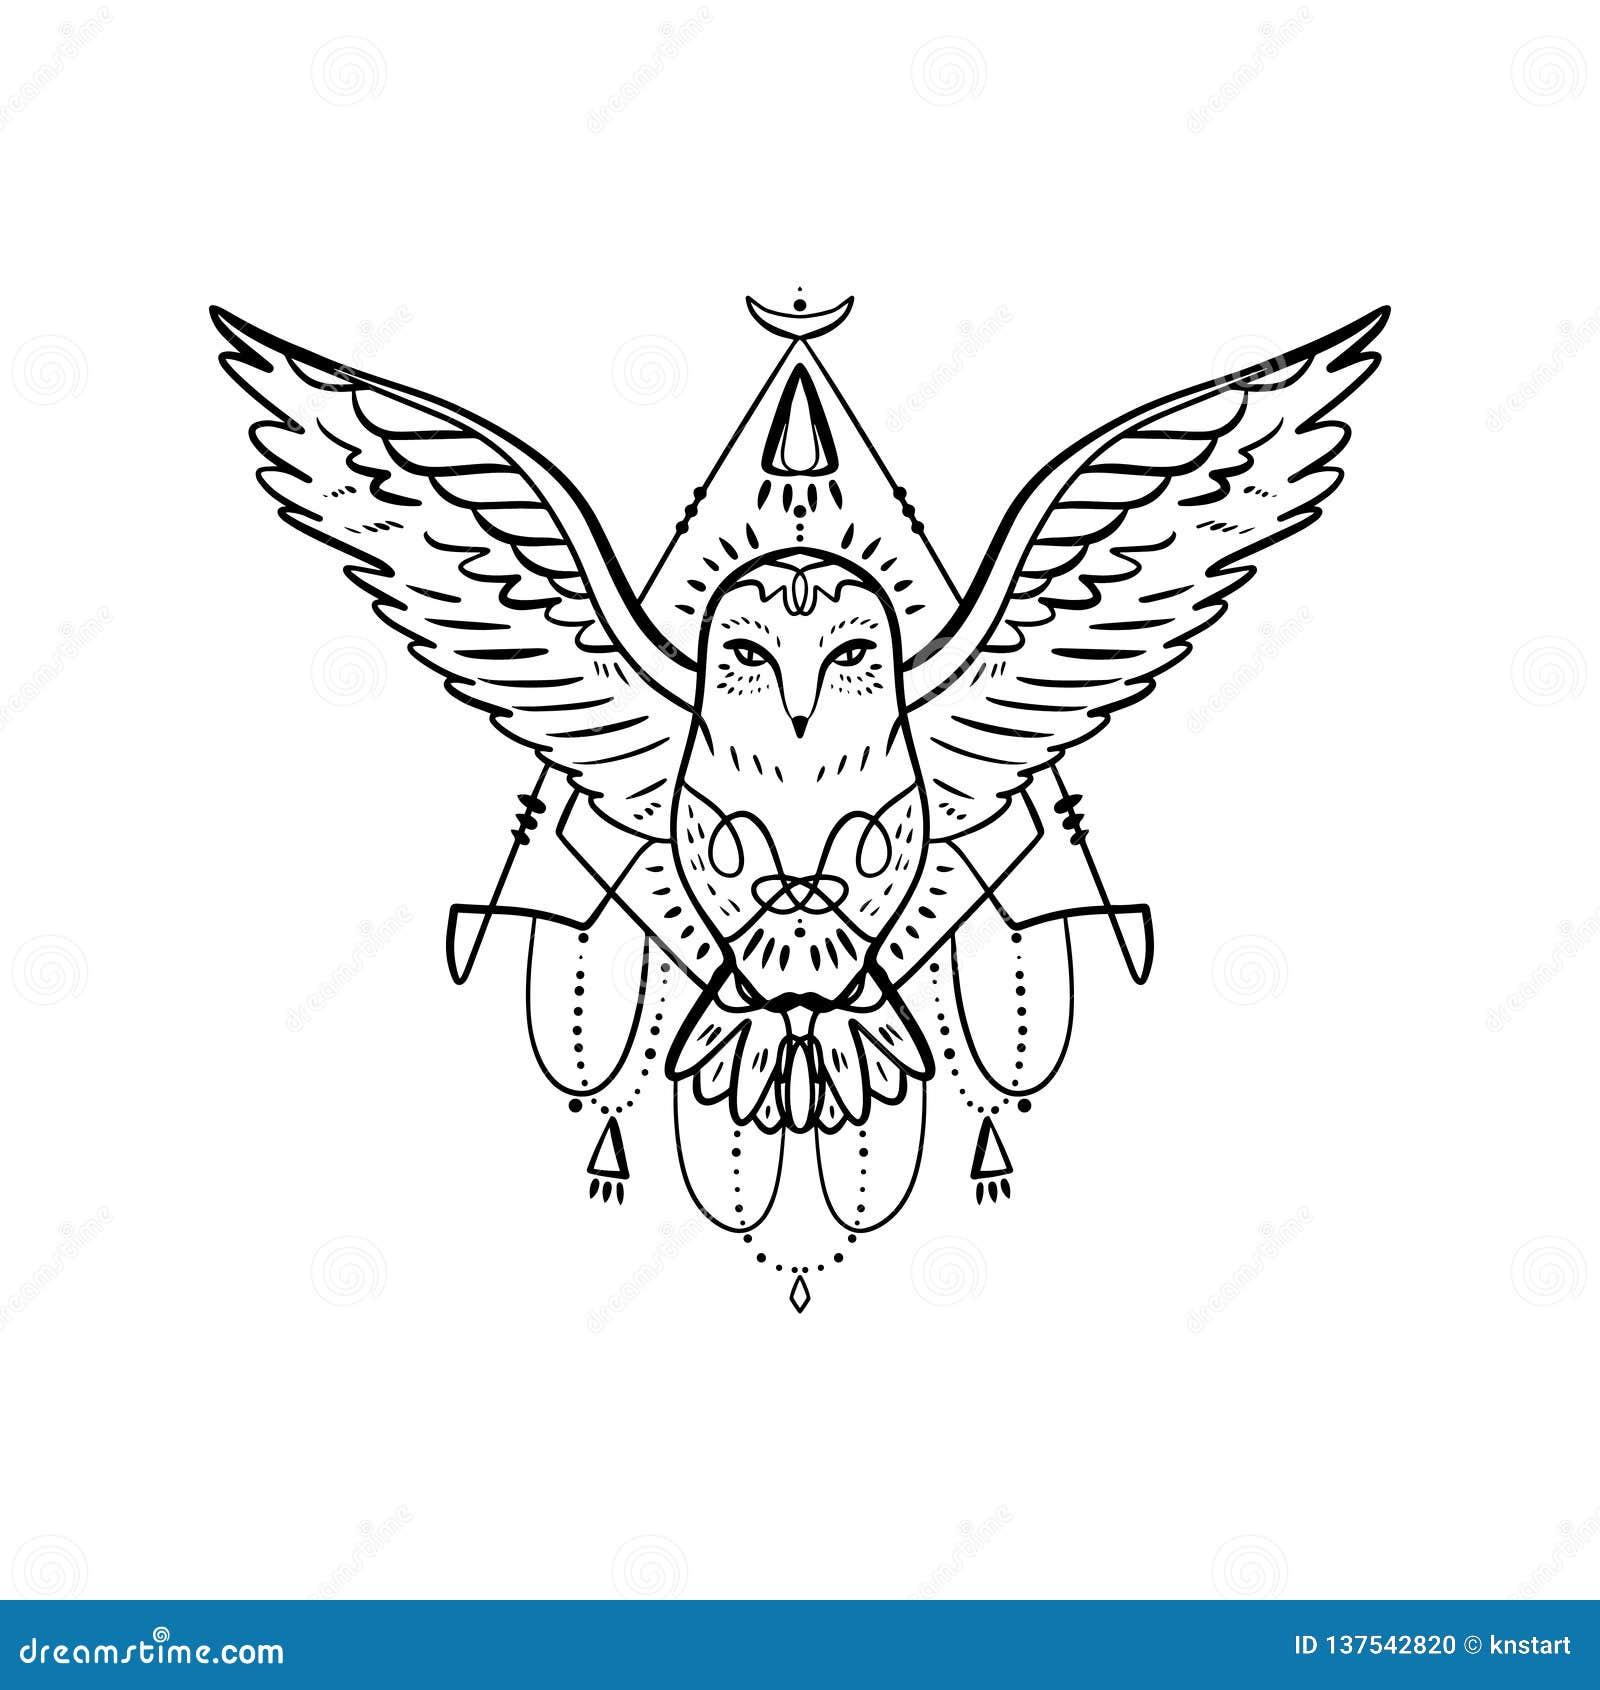 cc60c2d6b2429 Owl tattoo outline. Boho tribal style. Line ethnic ornaments. Poster,  spiritual art, symbol of wisdom. Antistress art. Good for t-shirts design,  bags, ...